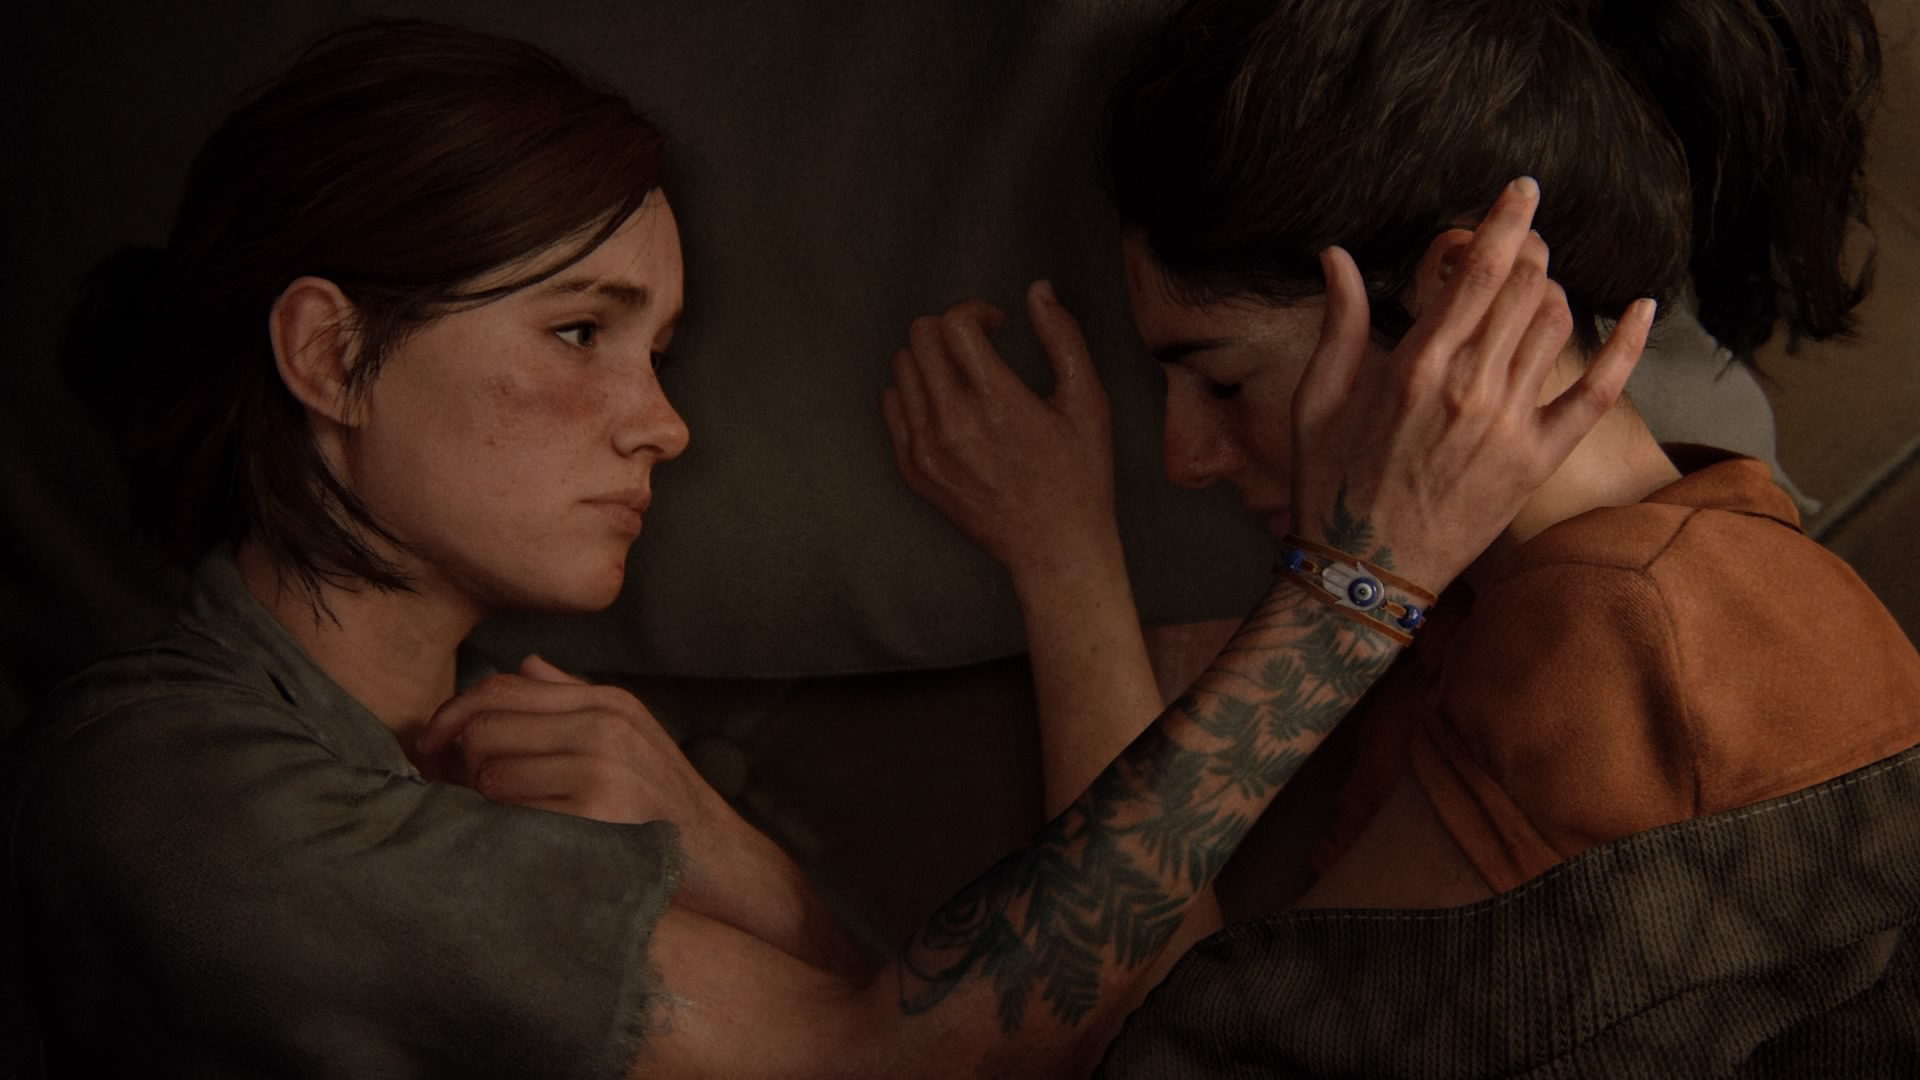 umy2pgbd7x_The Last of Us™ Parte II_20200716165008.jpg